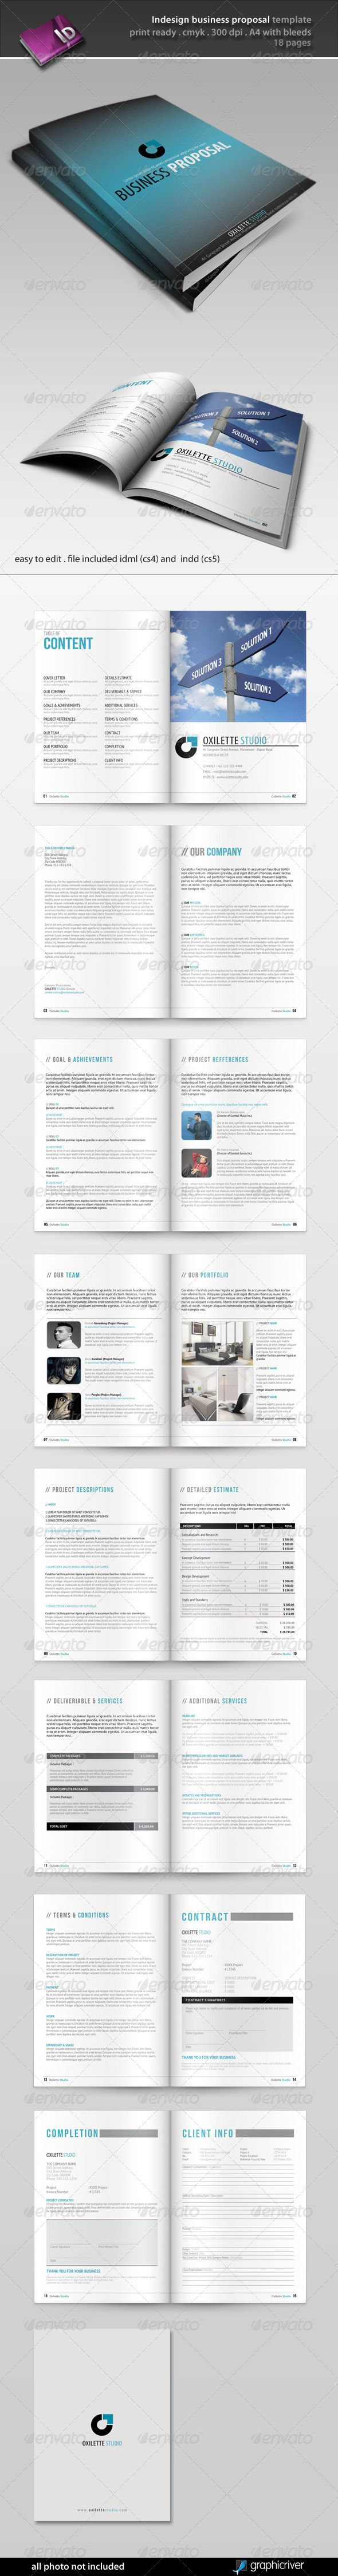 30 best business proposal design images on pinterest page layout indesign business proposal template accmission Images